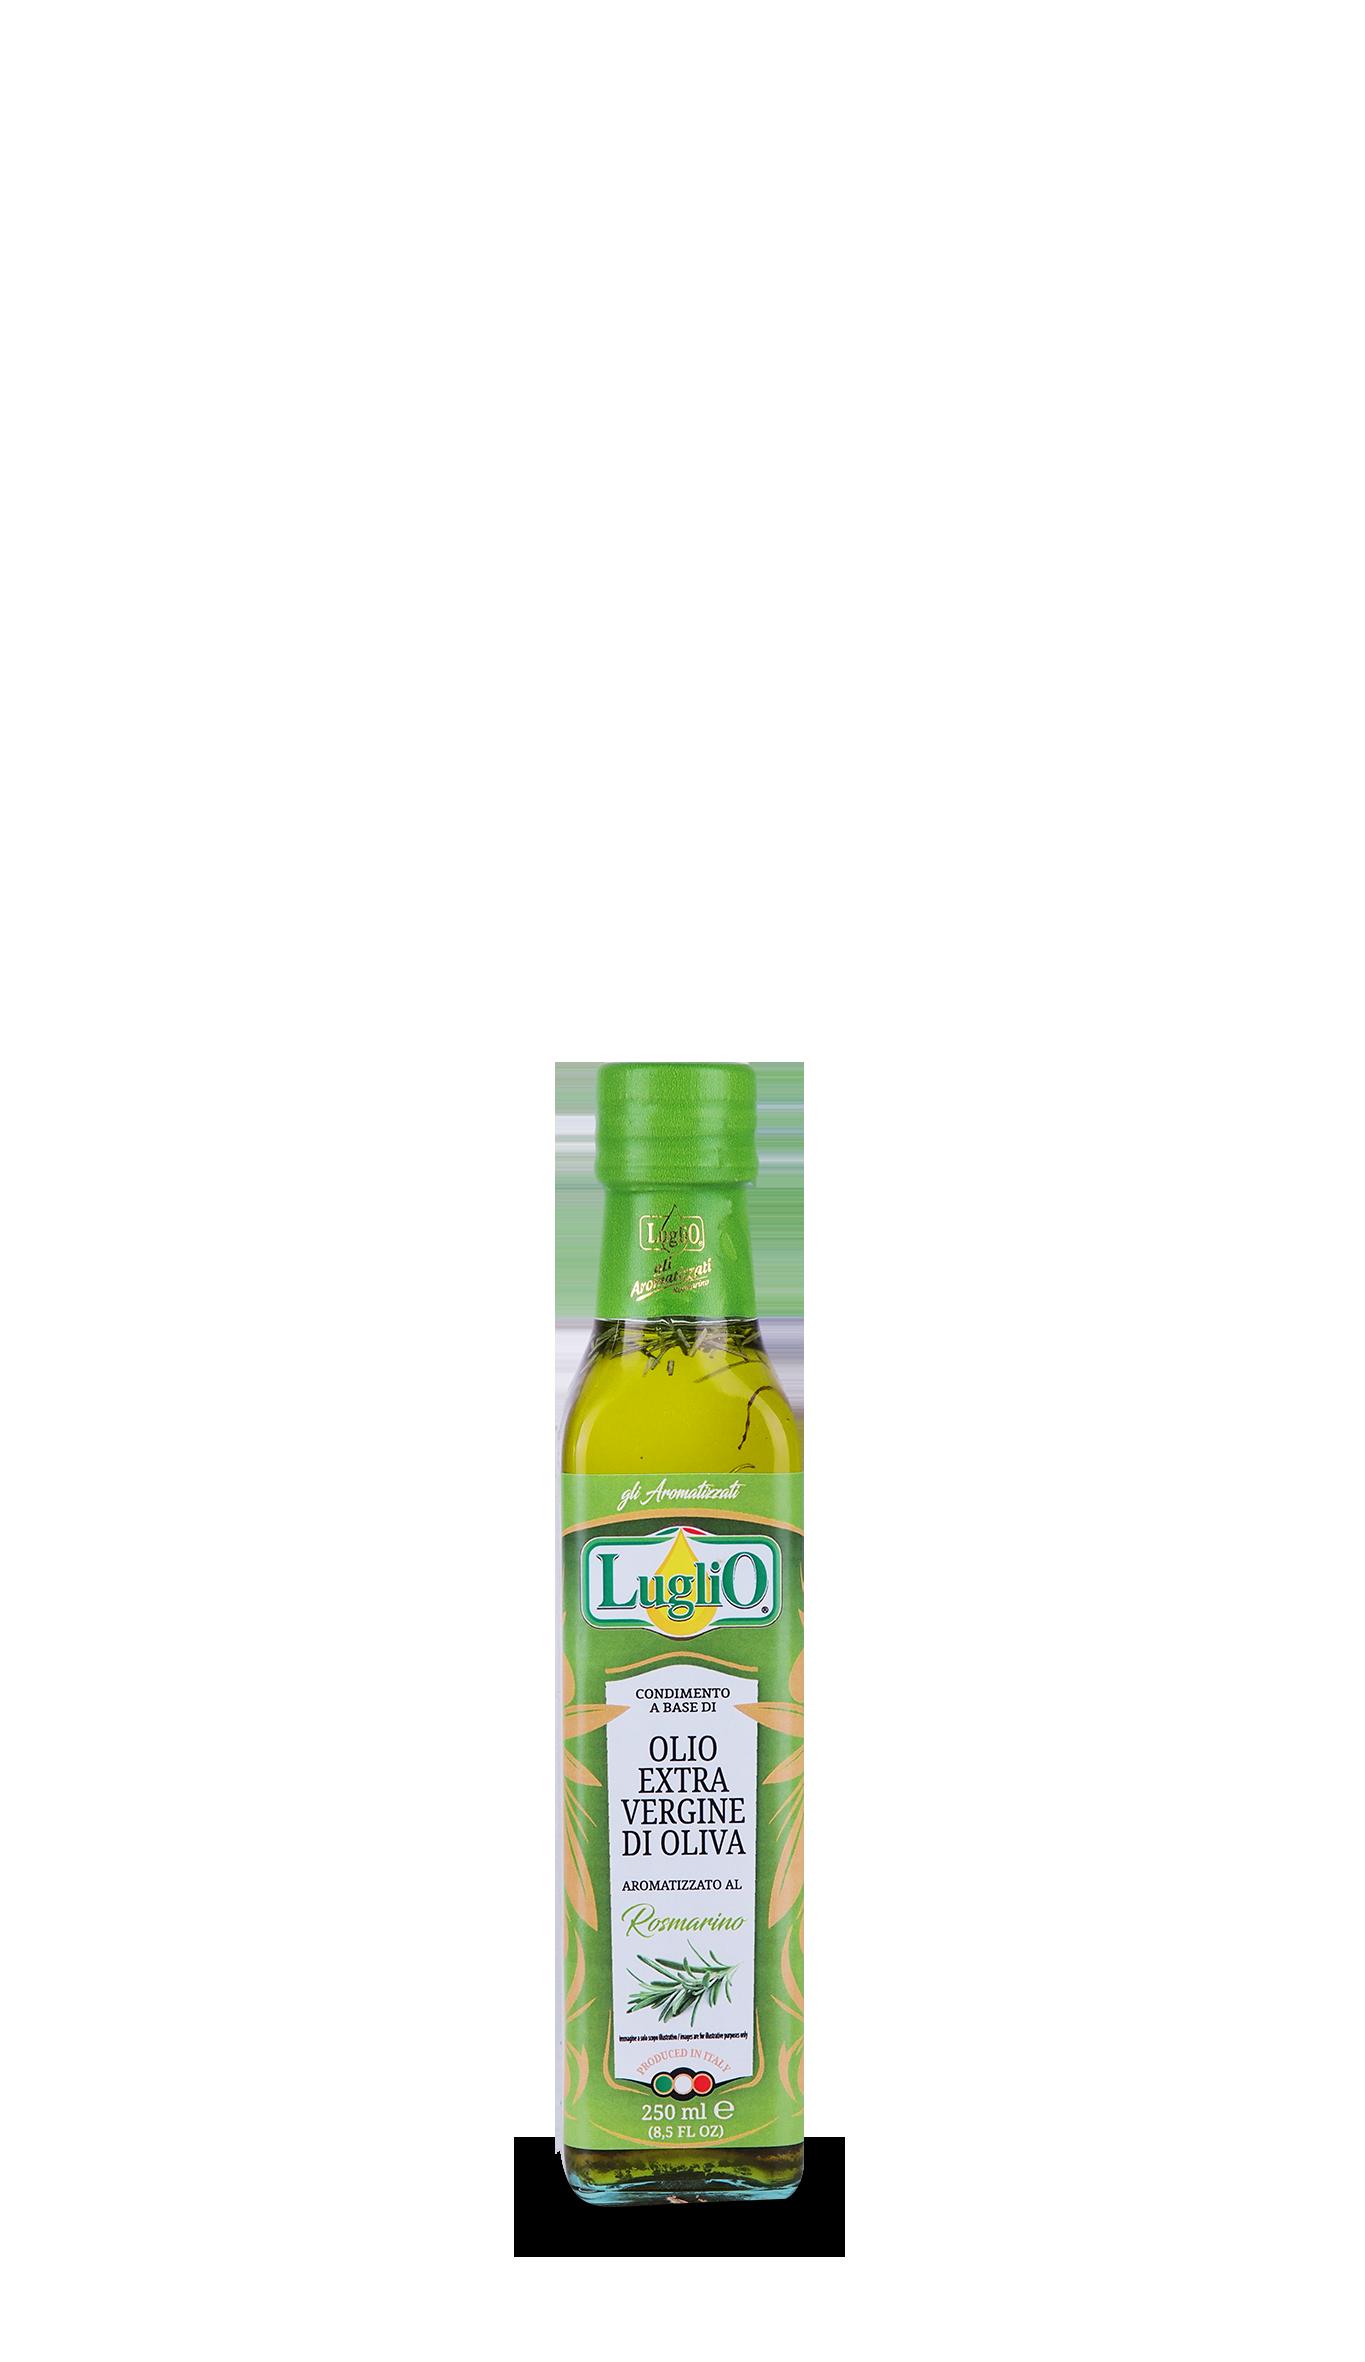 Olio Luglio aromatizzato rosmarino 250ml